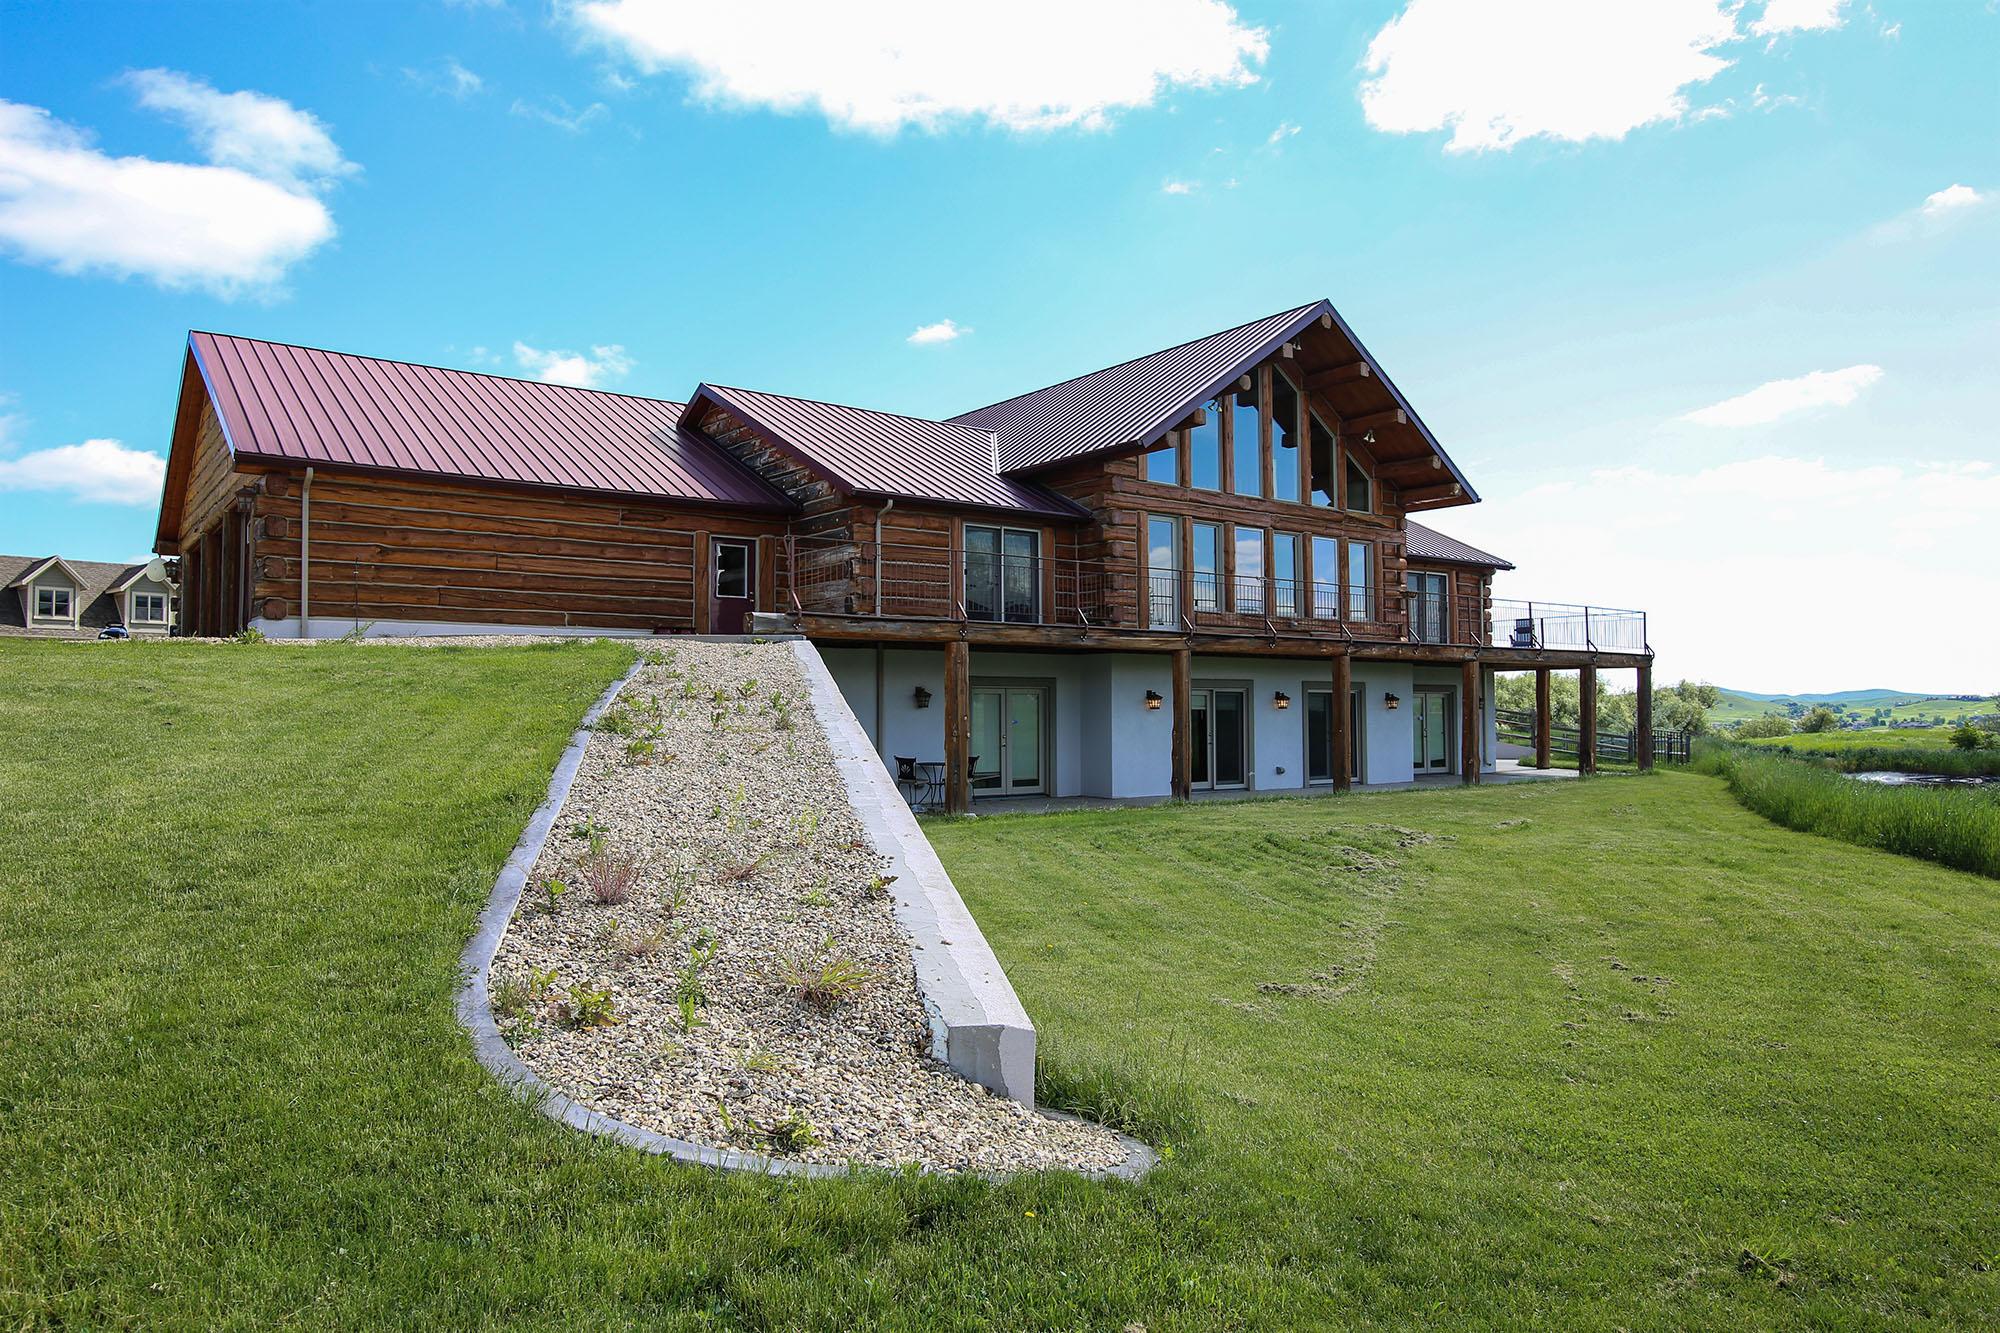 5 Valley Road, Big Horn, Wyoming 82833, 4 Bedrooms Bedrooms, ,4 BathroomsBathrooms,Residential,For Sale,Valley,19-134